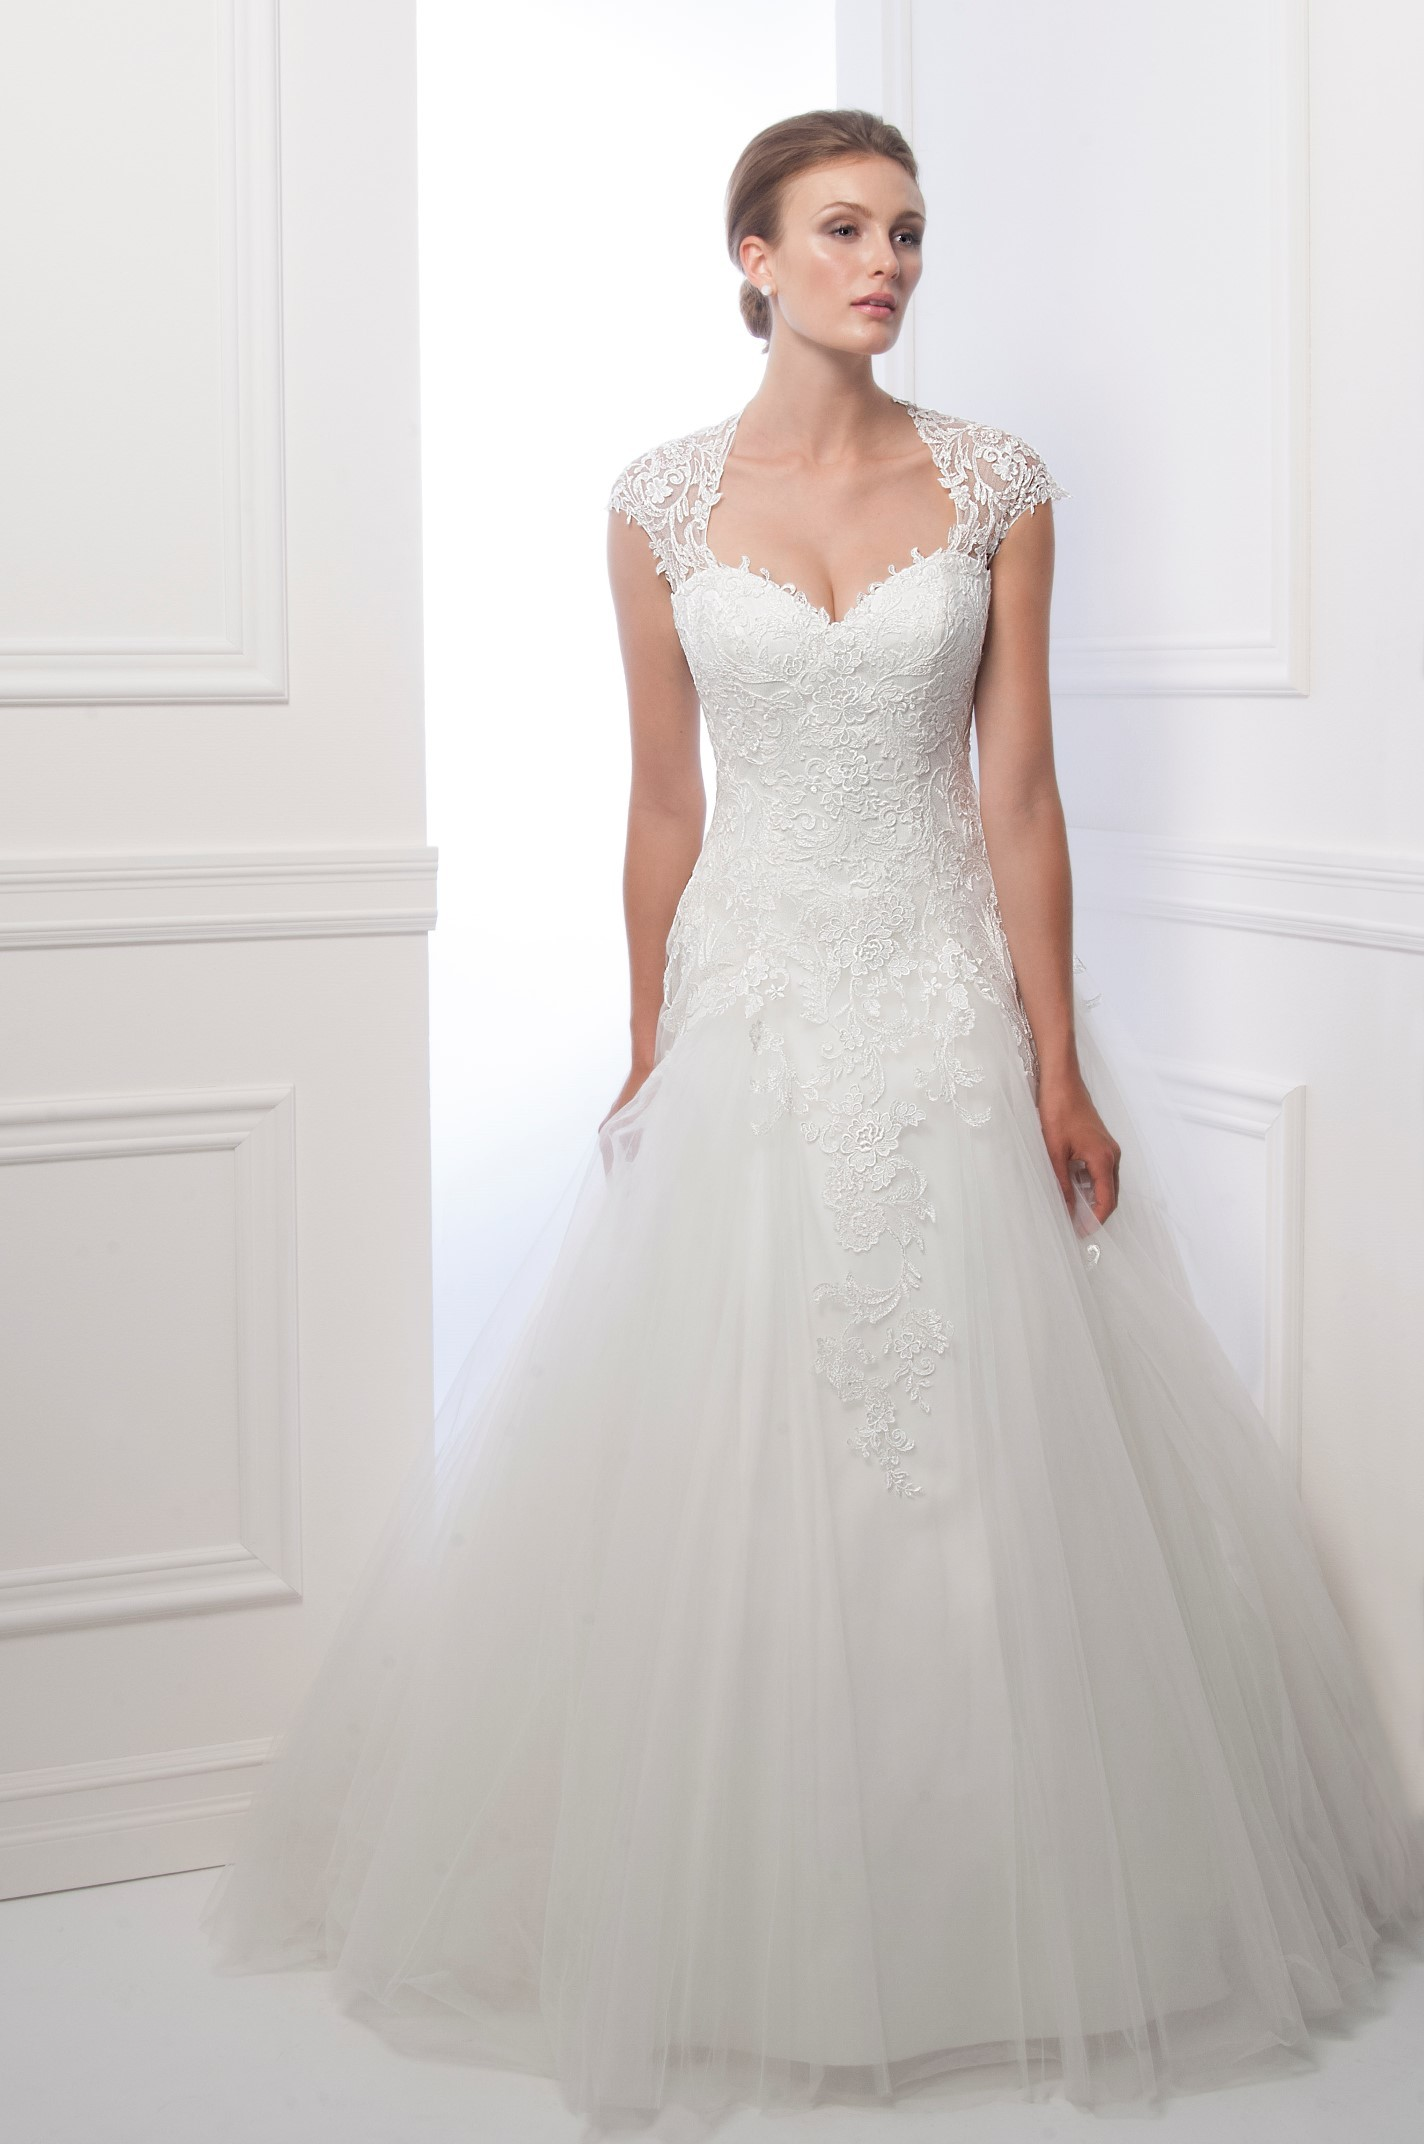 Dress alfred sung fall 2013 bridal 6929 alfredsung bridal alfred sung fall 2013 bridal 6929 ombrellifo Choice Image